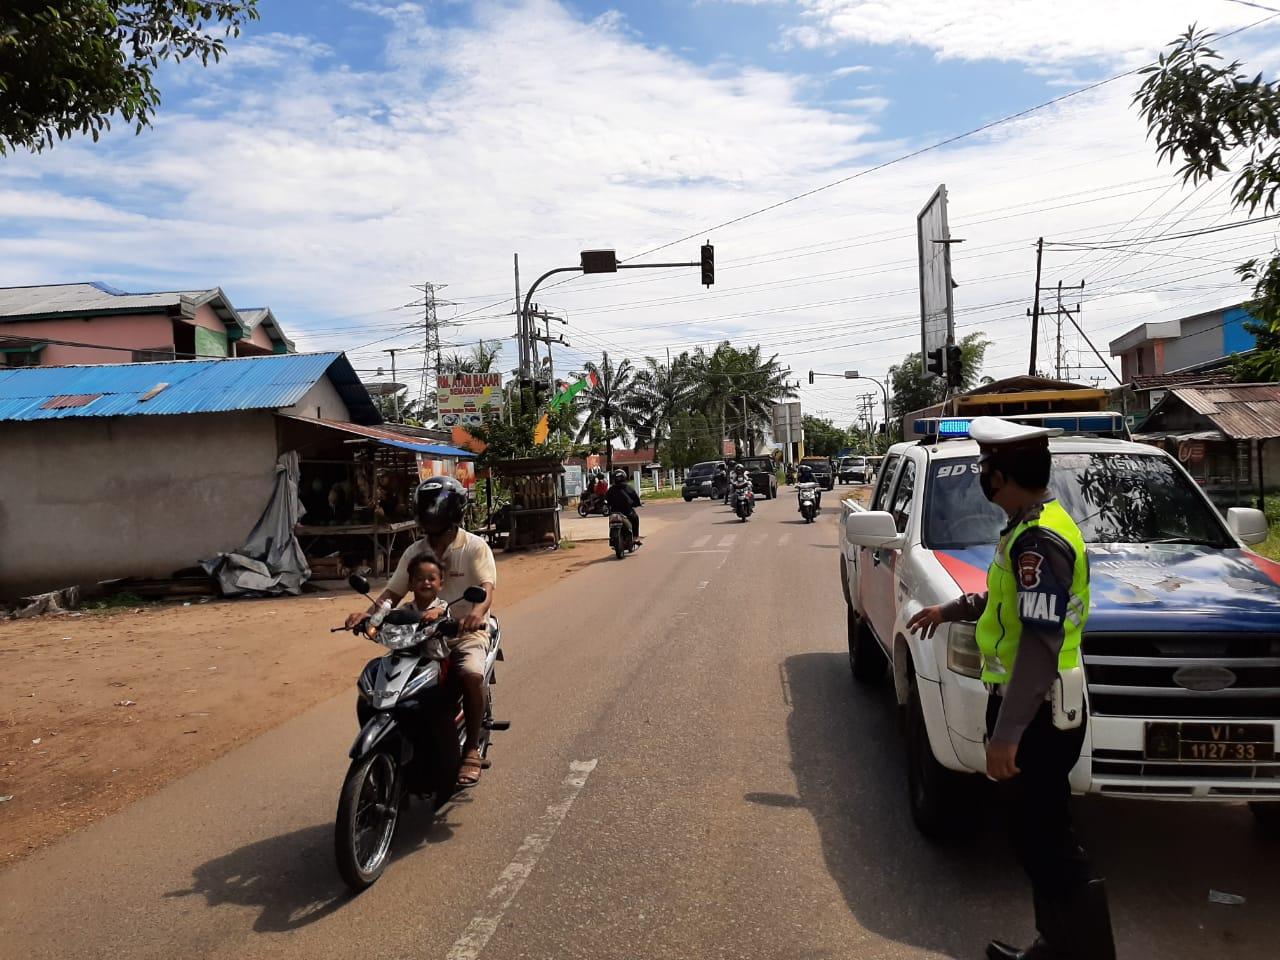 LAKSANAKAN PLOTING POIN PAGI , WUJUD PELAYANAN POLISI UNTUK MASYARAKAT